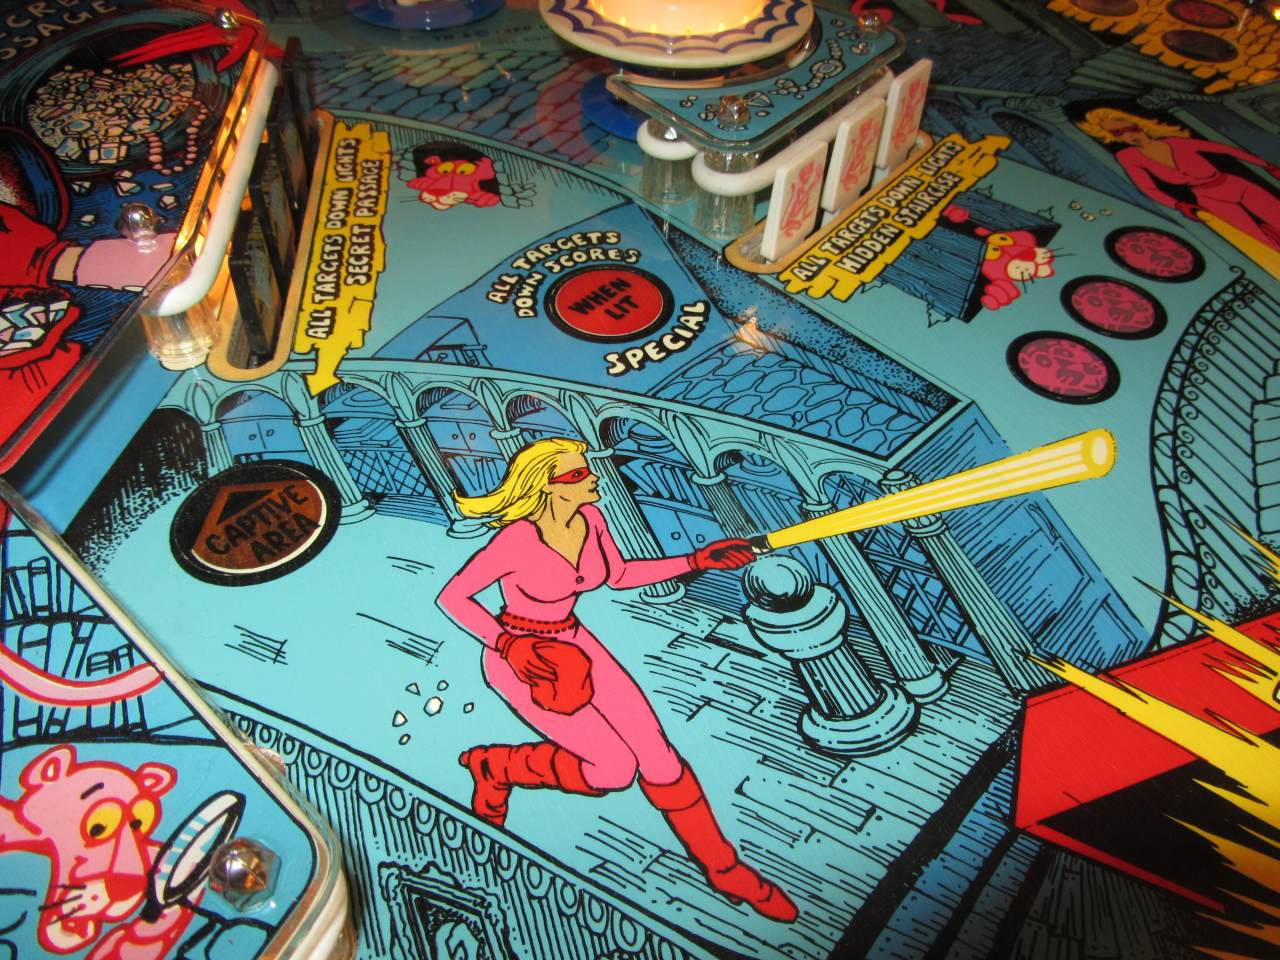 Gottlieb Pink Panther Pinball Machine 1  Pinballmania LLC